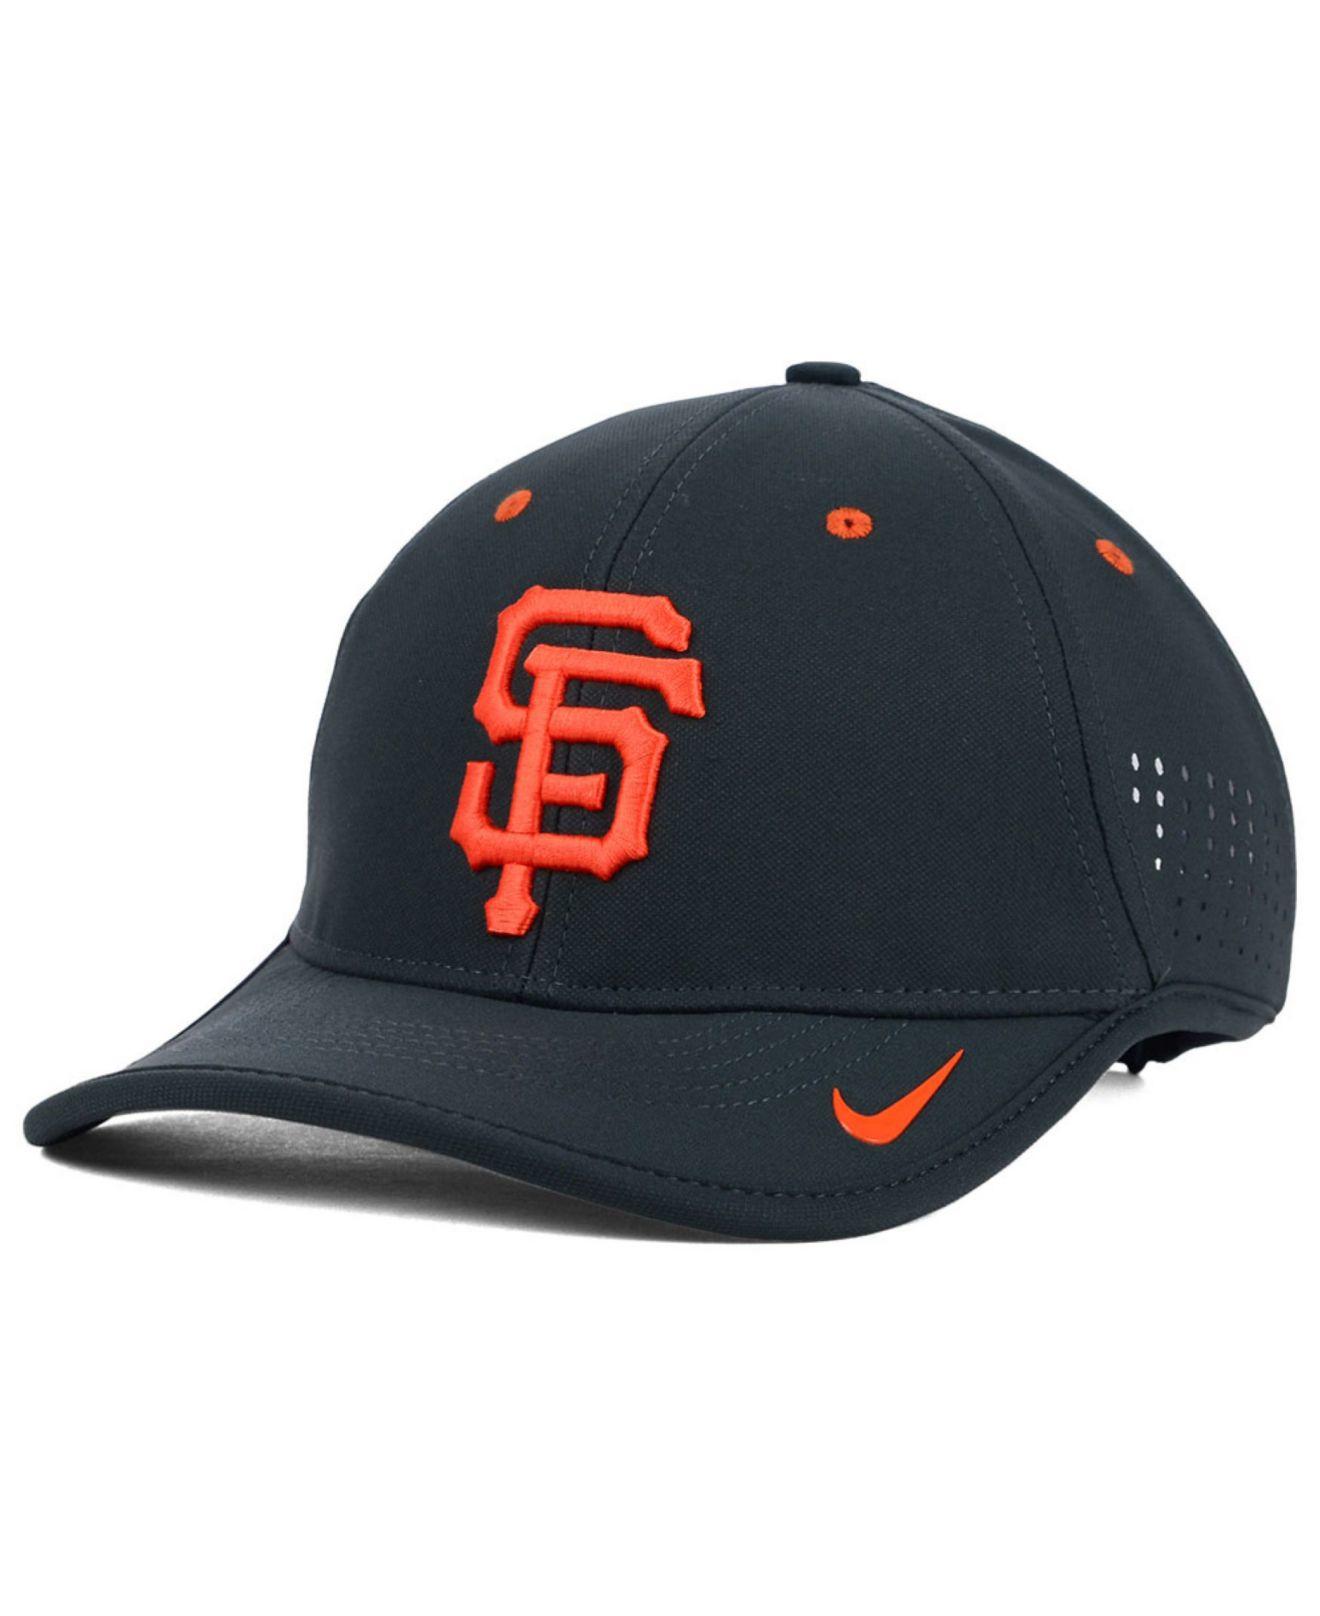 premium selection 3d07d c1c4e Nike San Francisco Giants Vapor Swoosh Adjustable Cap in Gray for ...